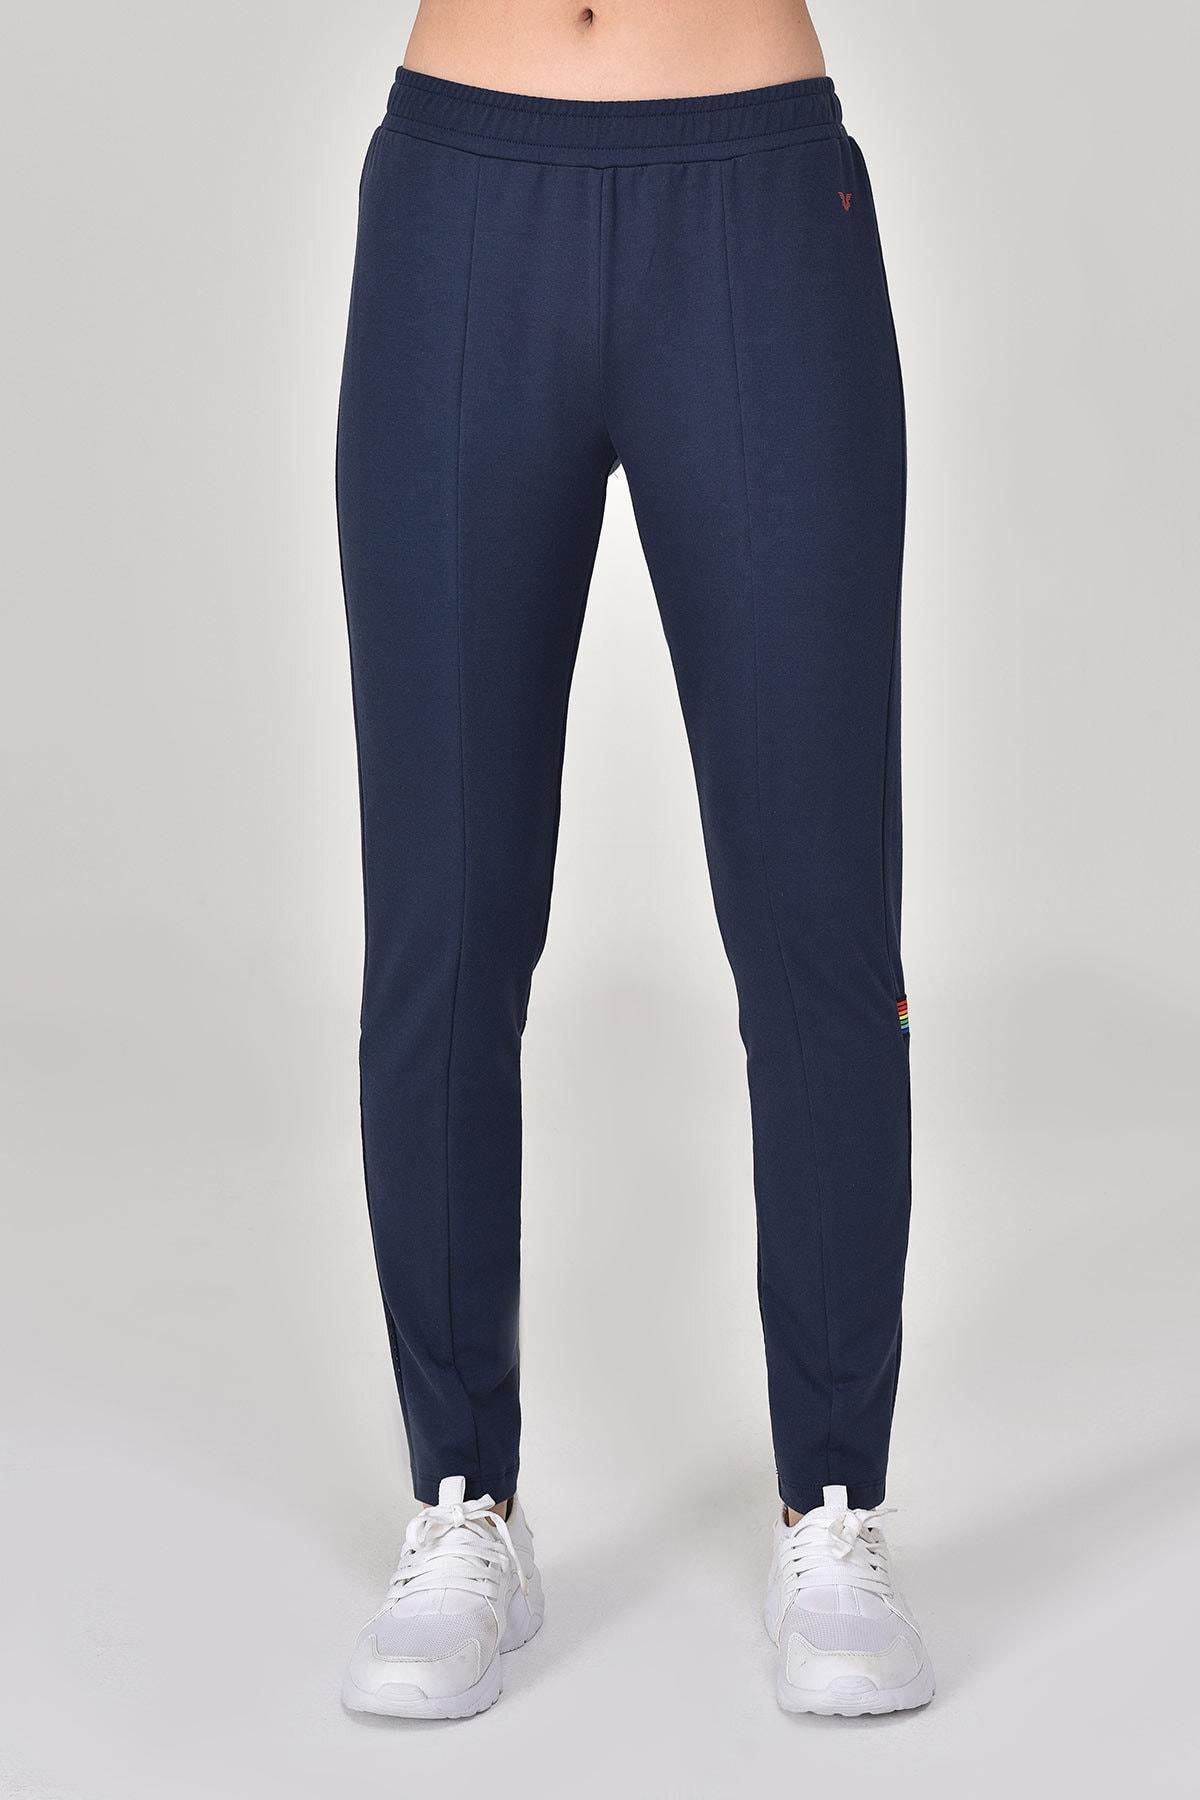 bilcee Lacivert Kadın Pantolon  GS-8095 2